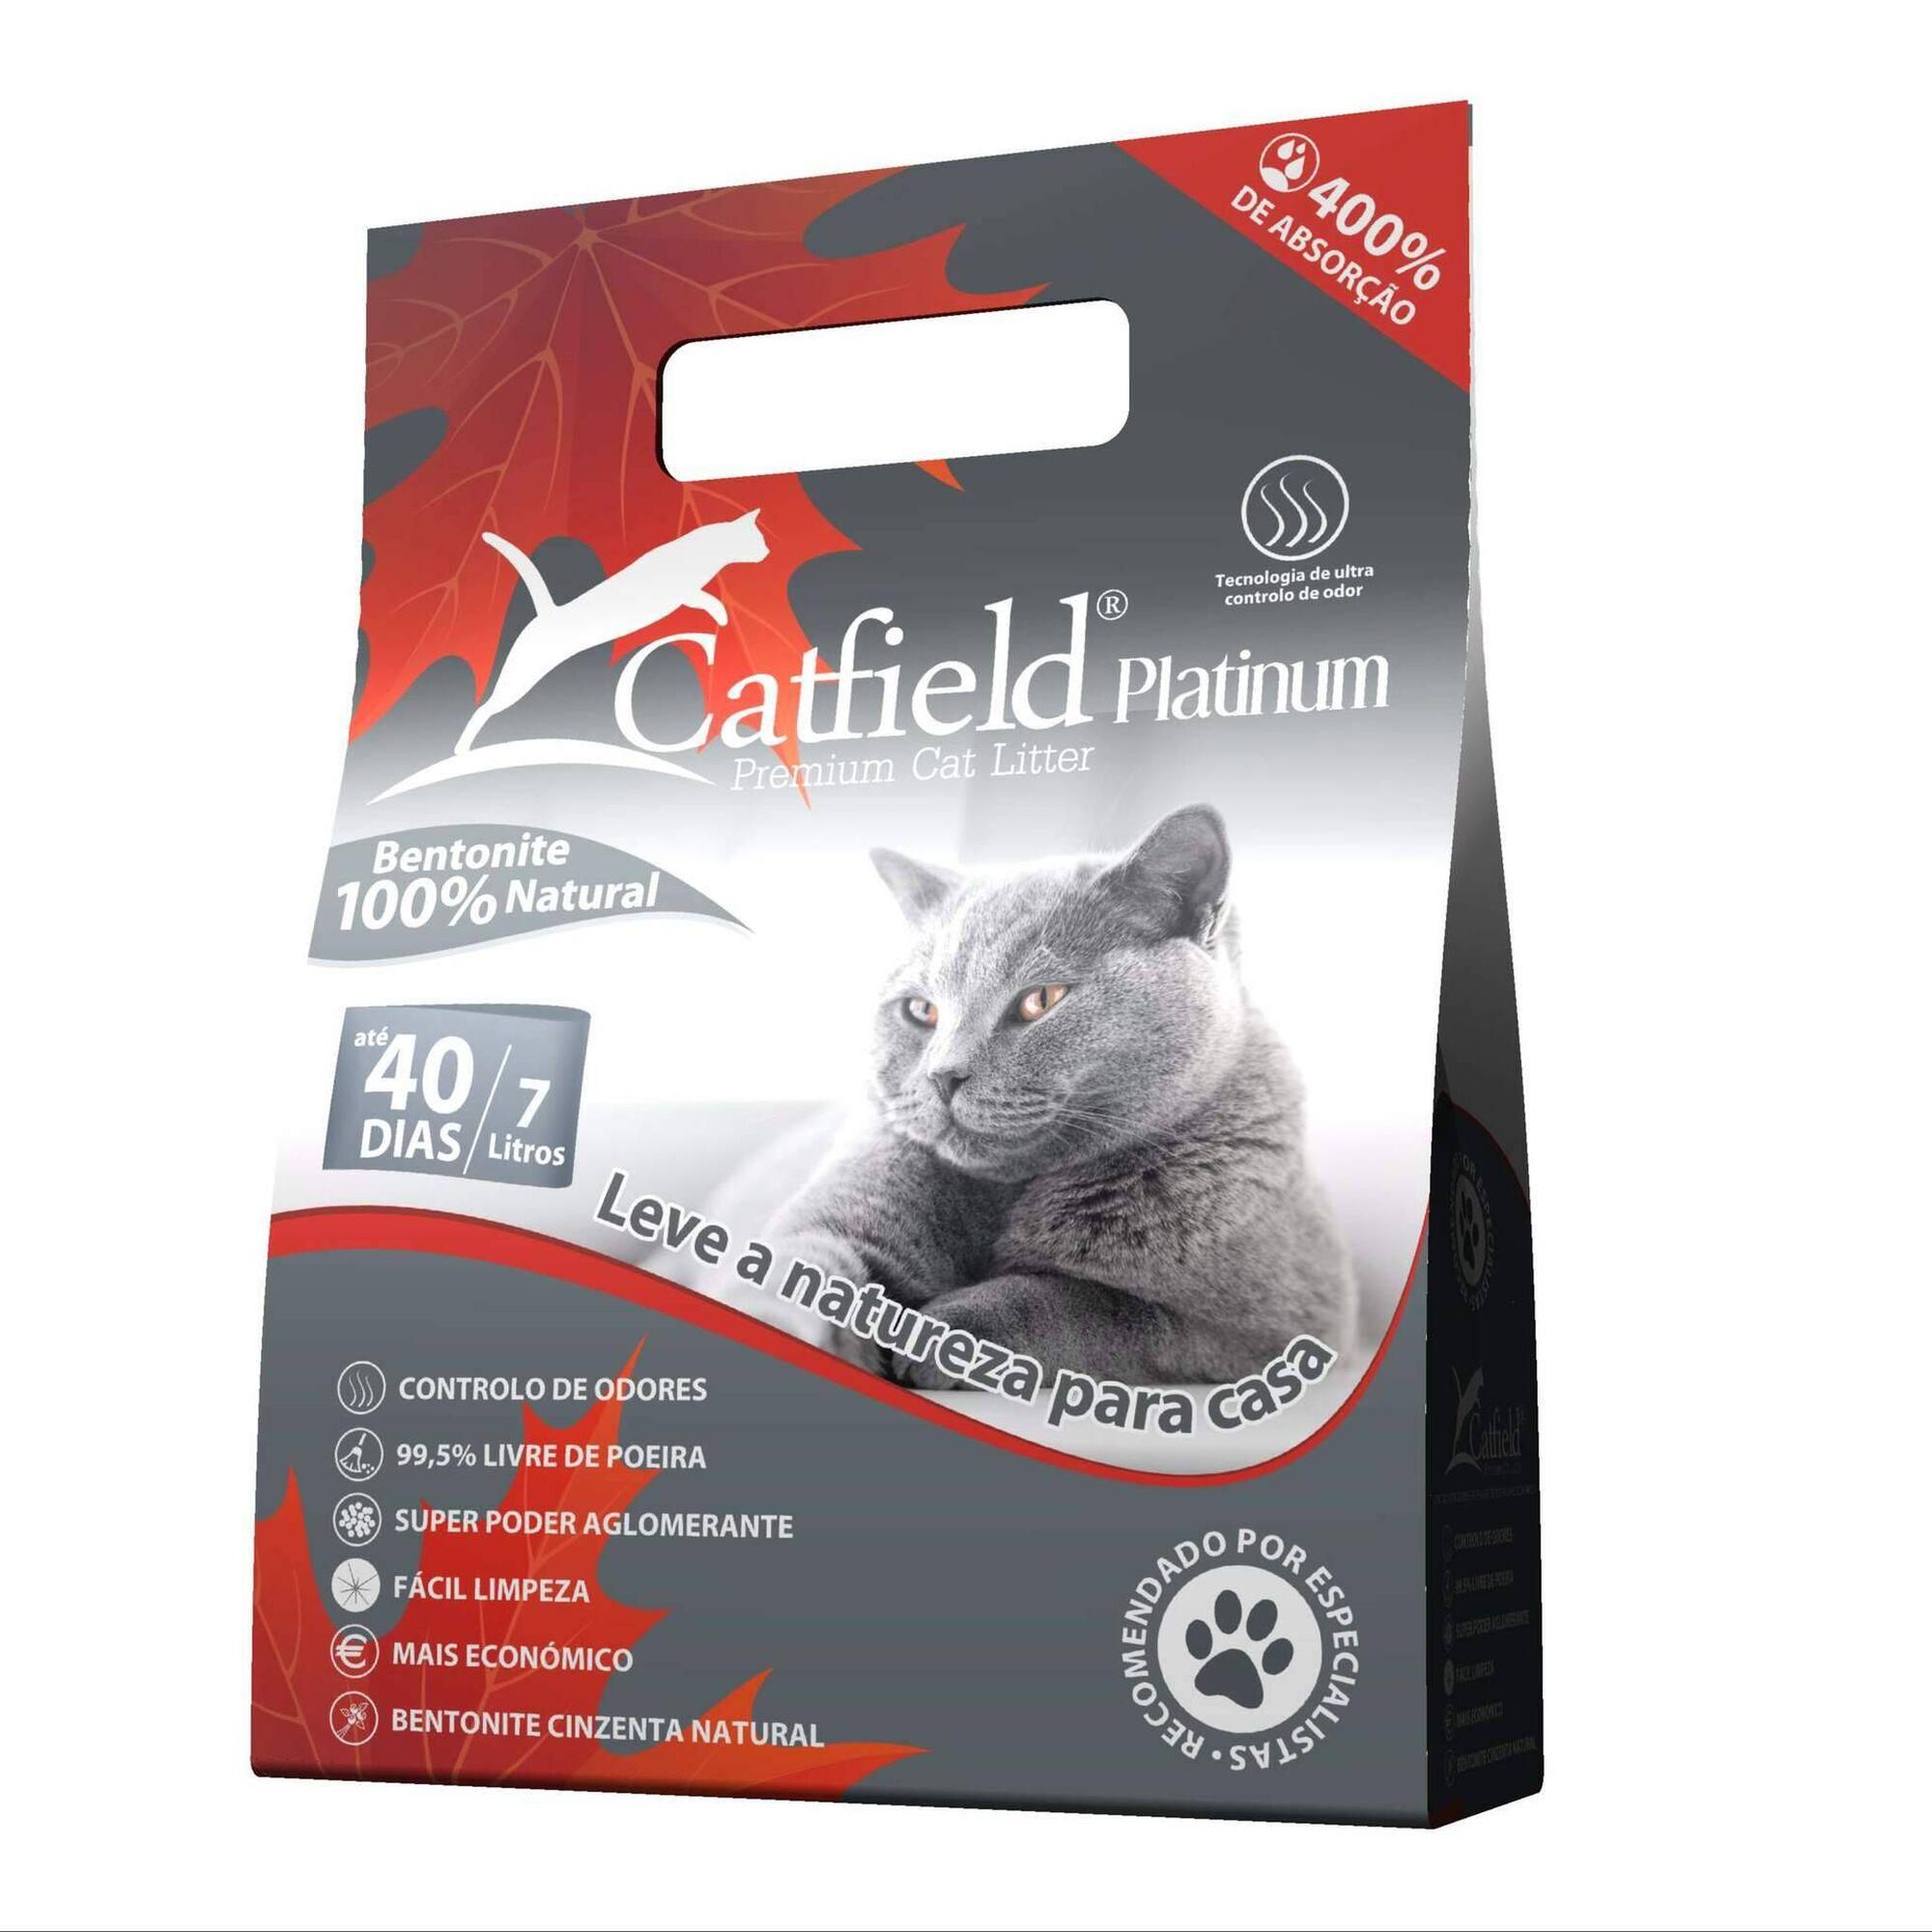 Absorvente para Gato Bentonite Aglomerante Natural